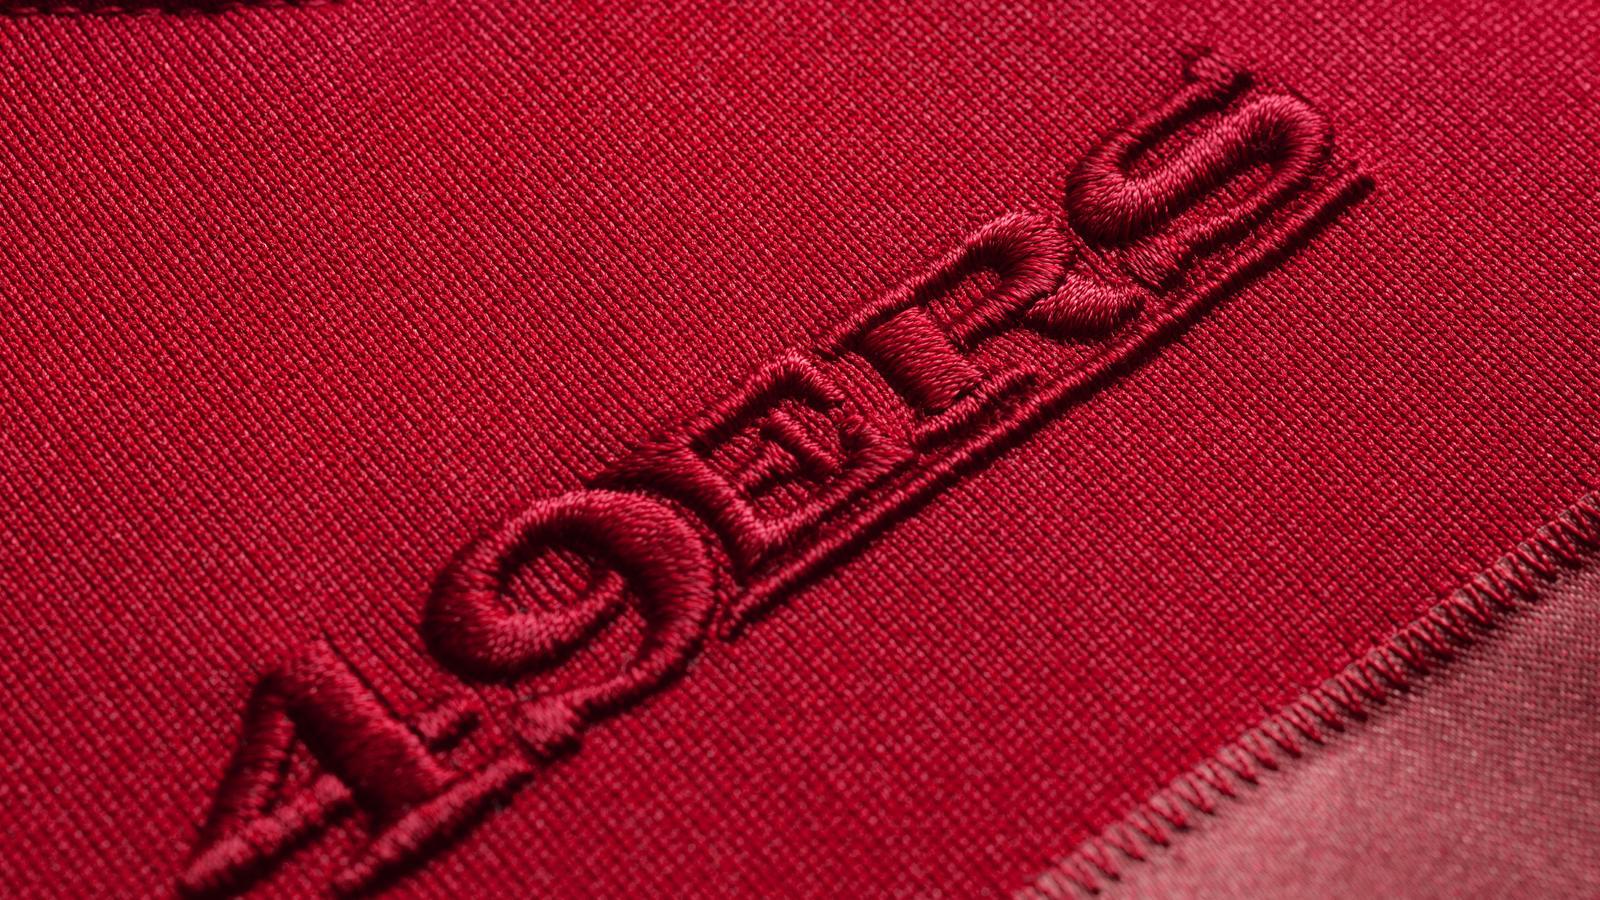 fa13_at_drenchpack_49ers_details_002_lr